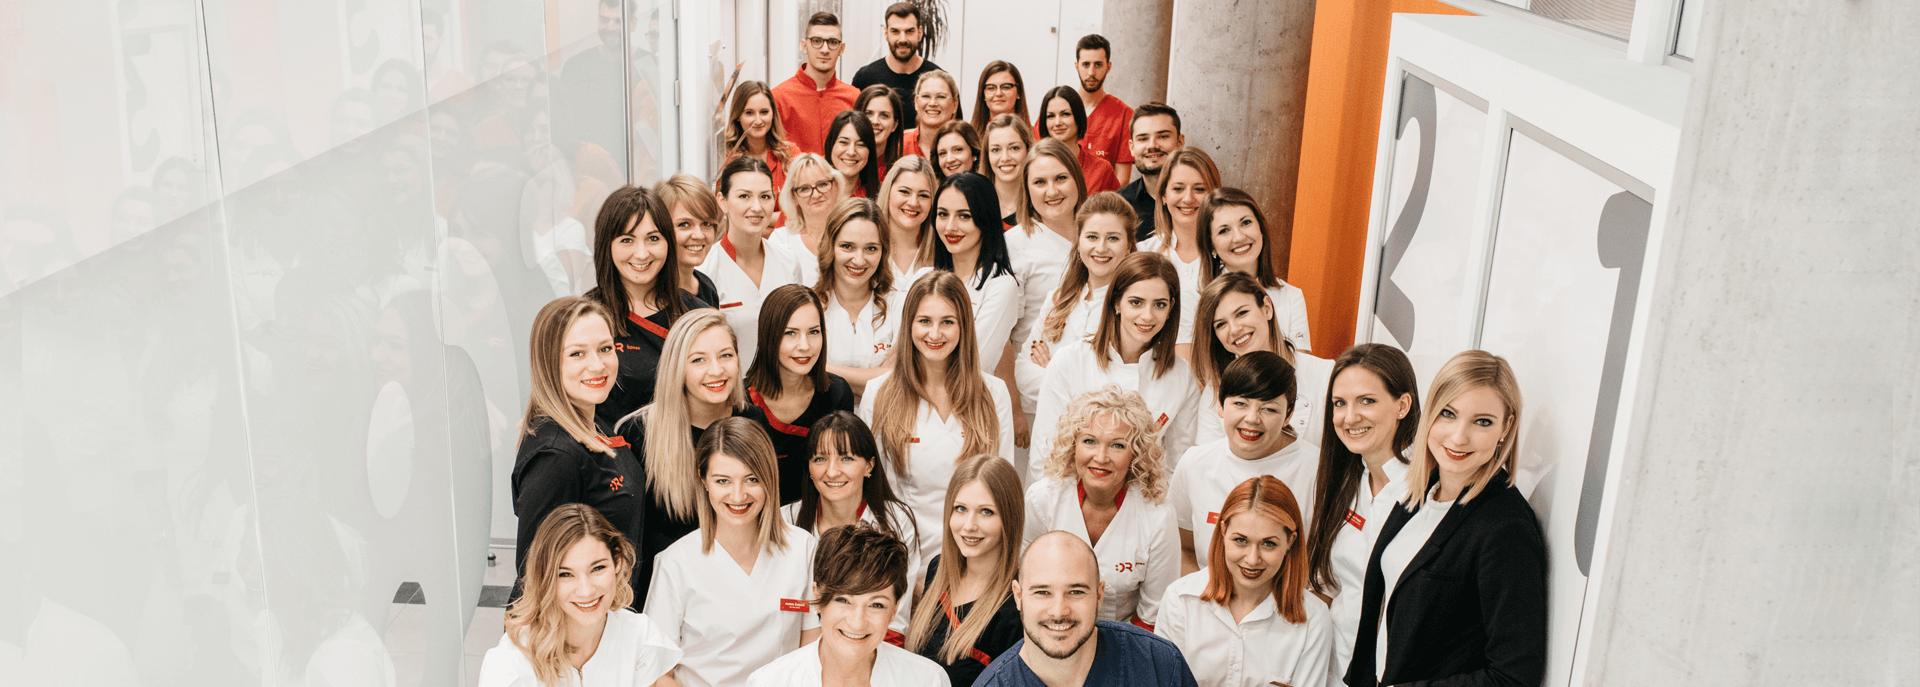 Inozemni pacijenti | Stomatološka poliklinika Štimac | Zagreb